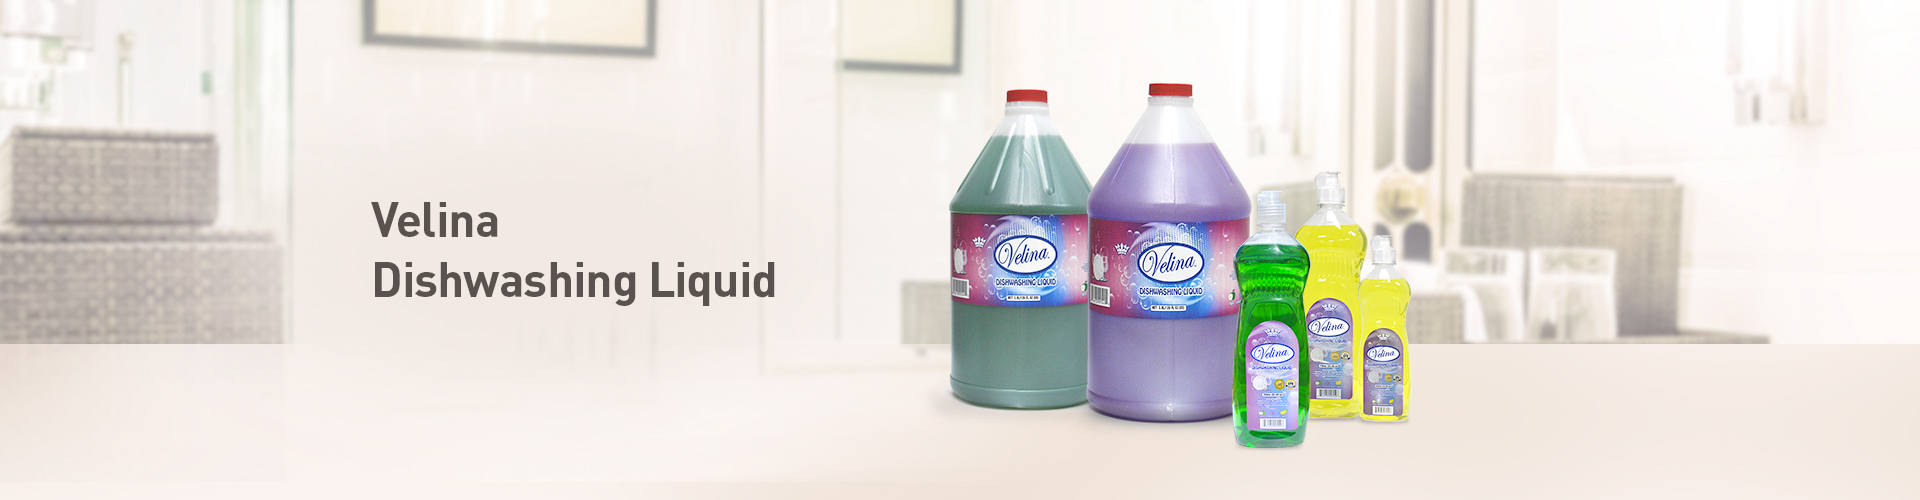 Velina Dishwashing liquid